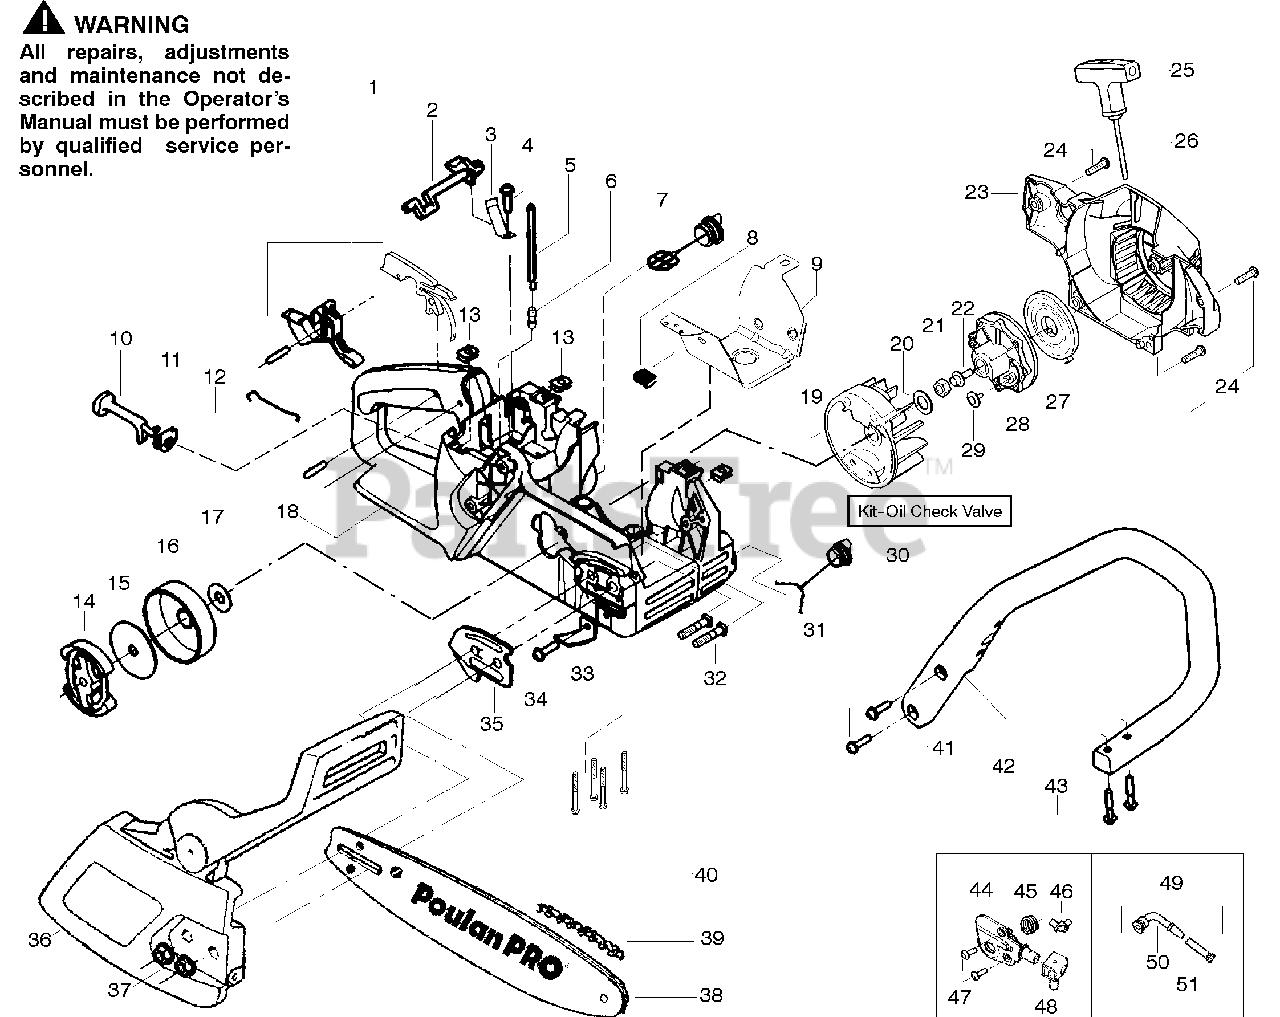 Poulan Bvm200vs Wiring Diagram -1993 Acura Legend Fuse Box Diagram |  Begeboy Wiring Diagram Source | Wiring Poulan Diagram Pp11536ka |  | Begeboy Wiring Diagram Source